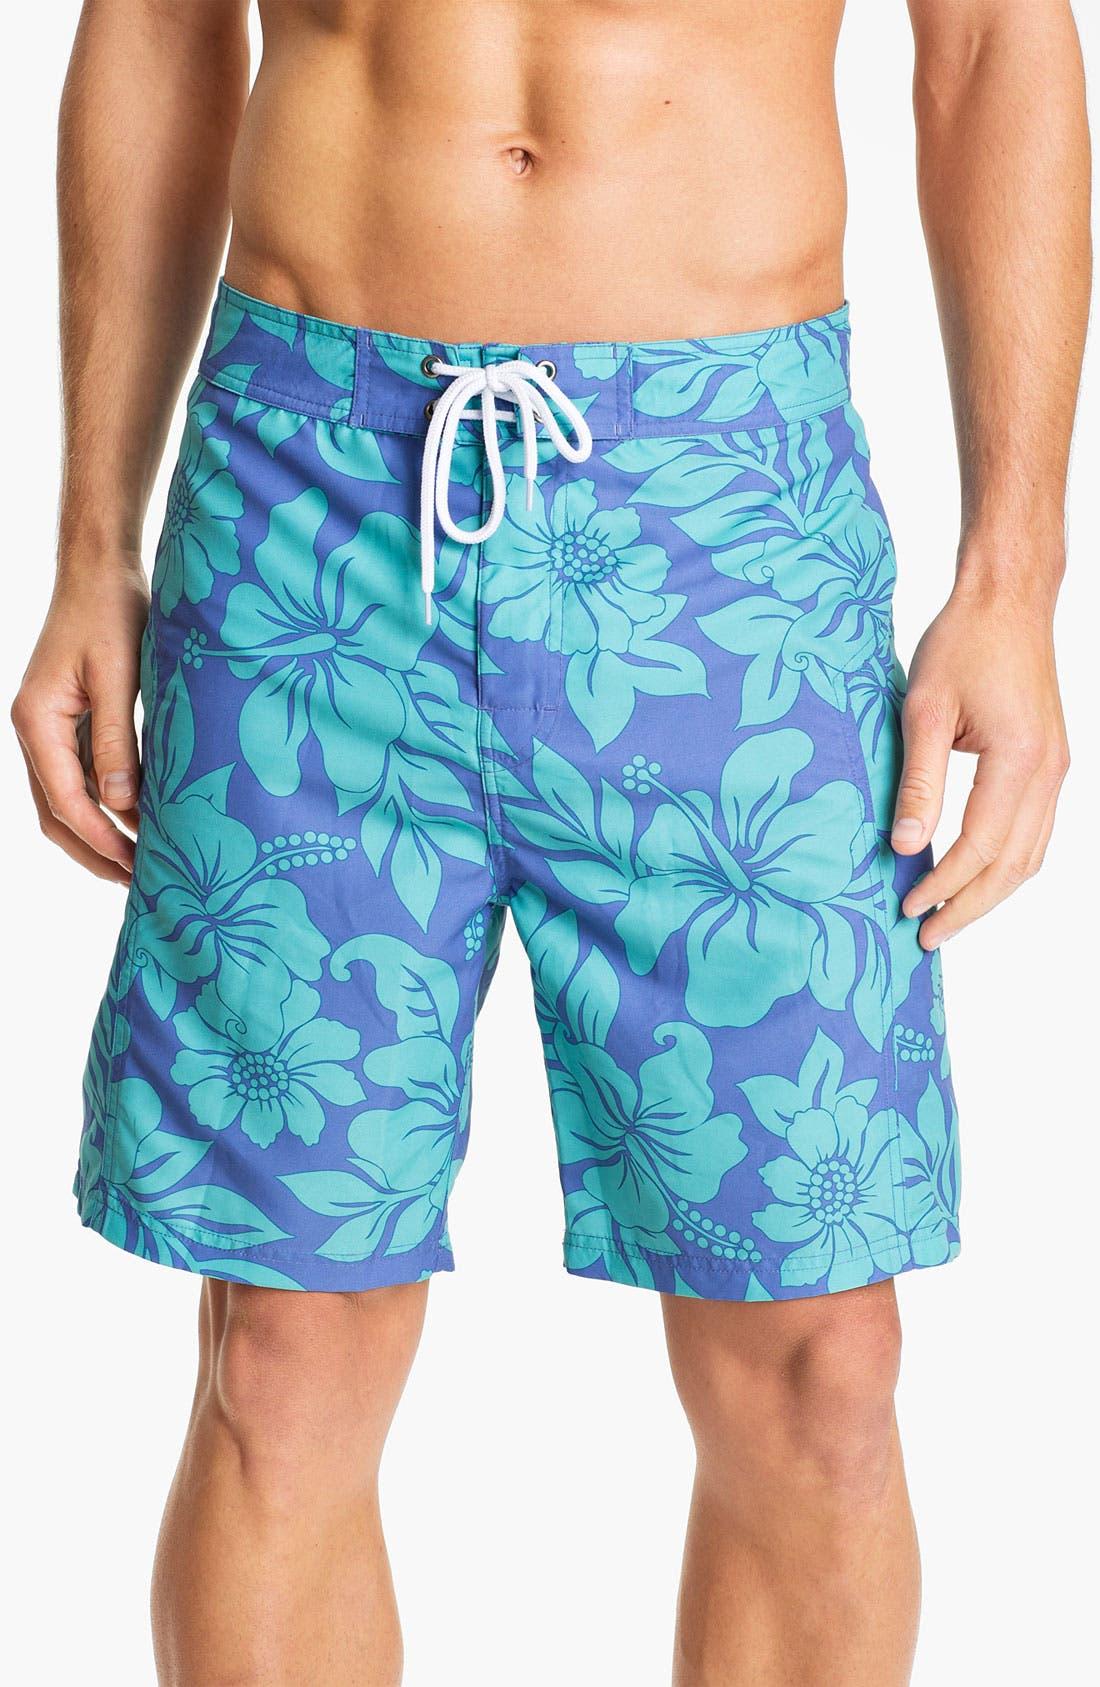 Main Image - Trunks Surf & Swim 'Salty Boardie' Board Shorts